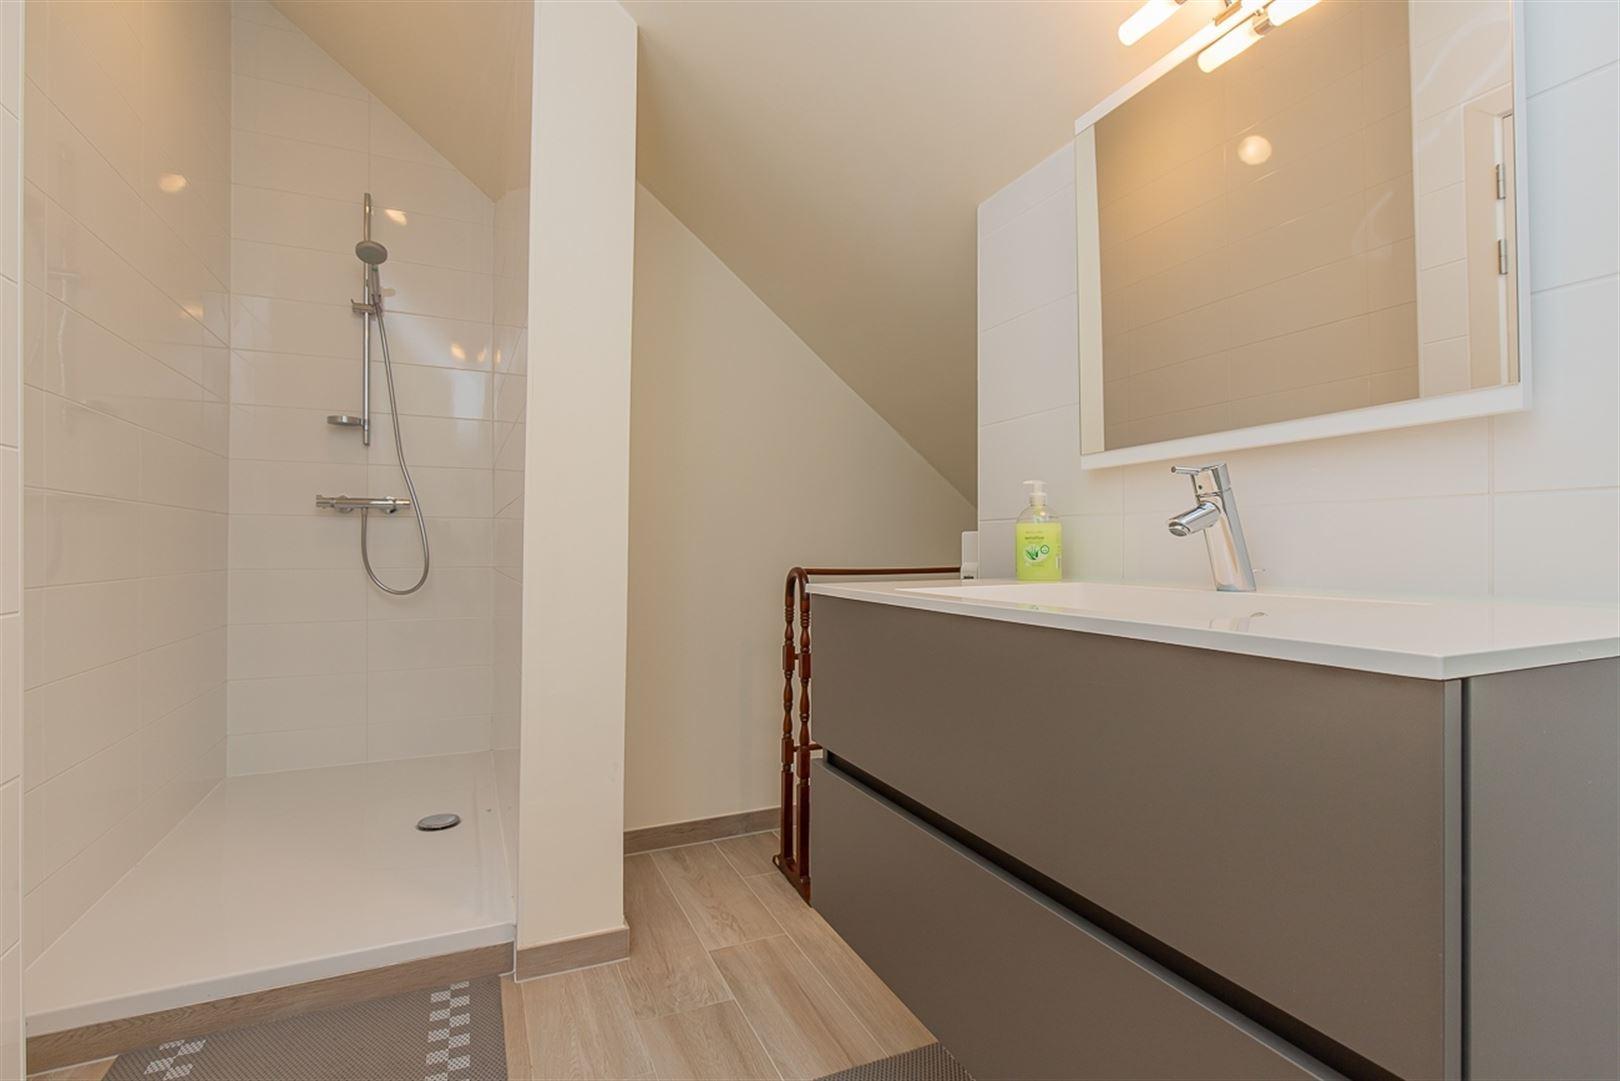 Foto 15 : Duplex/Penthouse te 9200 DENDERMONDE (België) - Prijs € 399.000